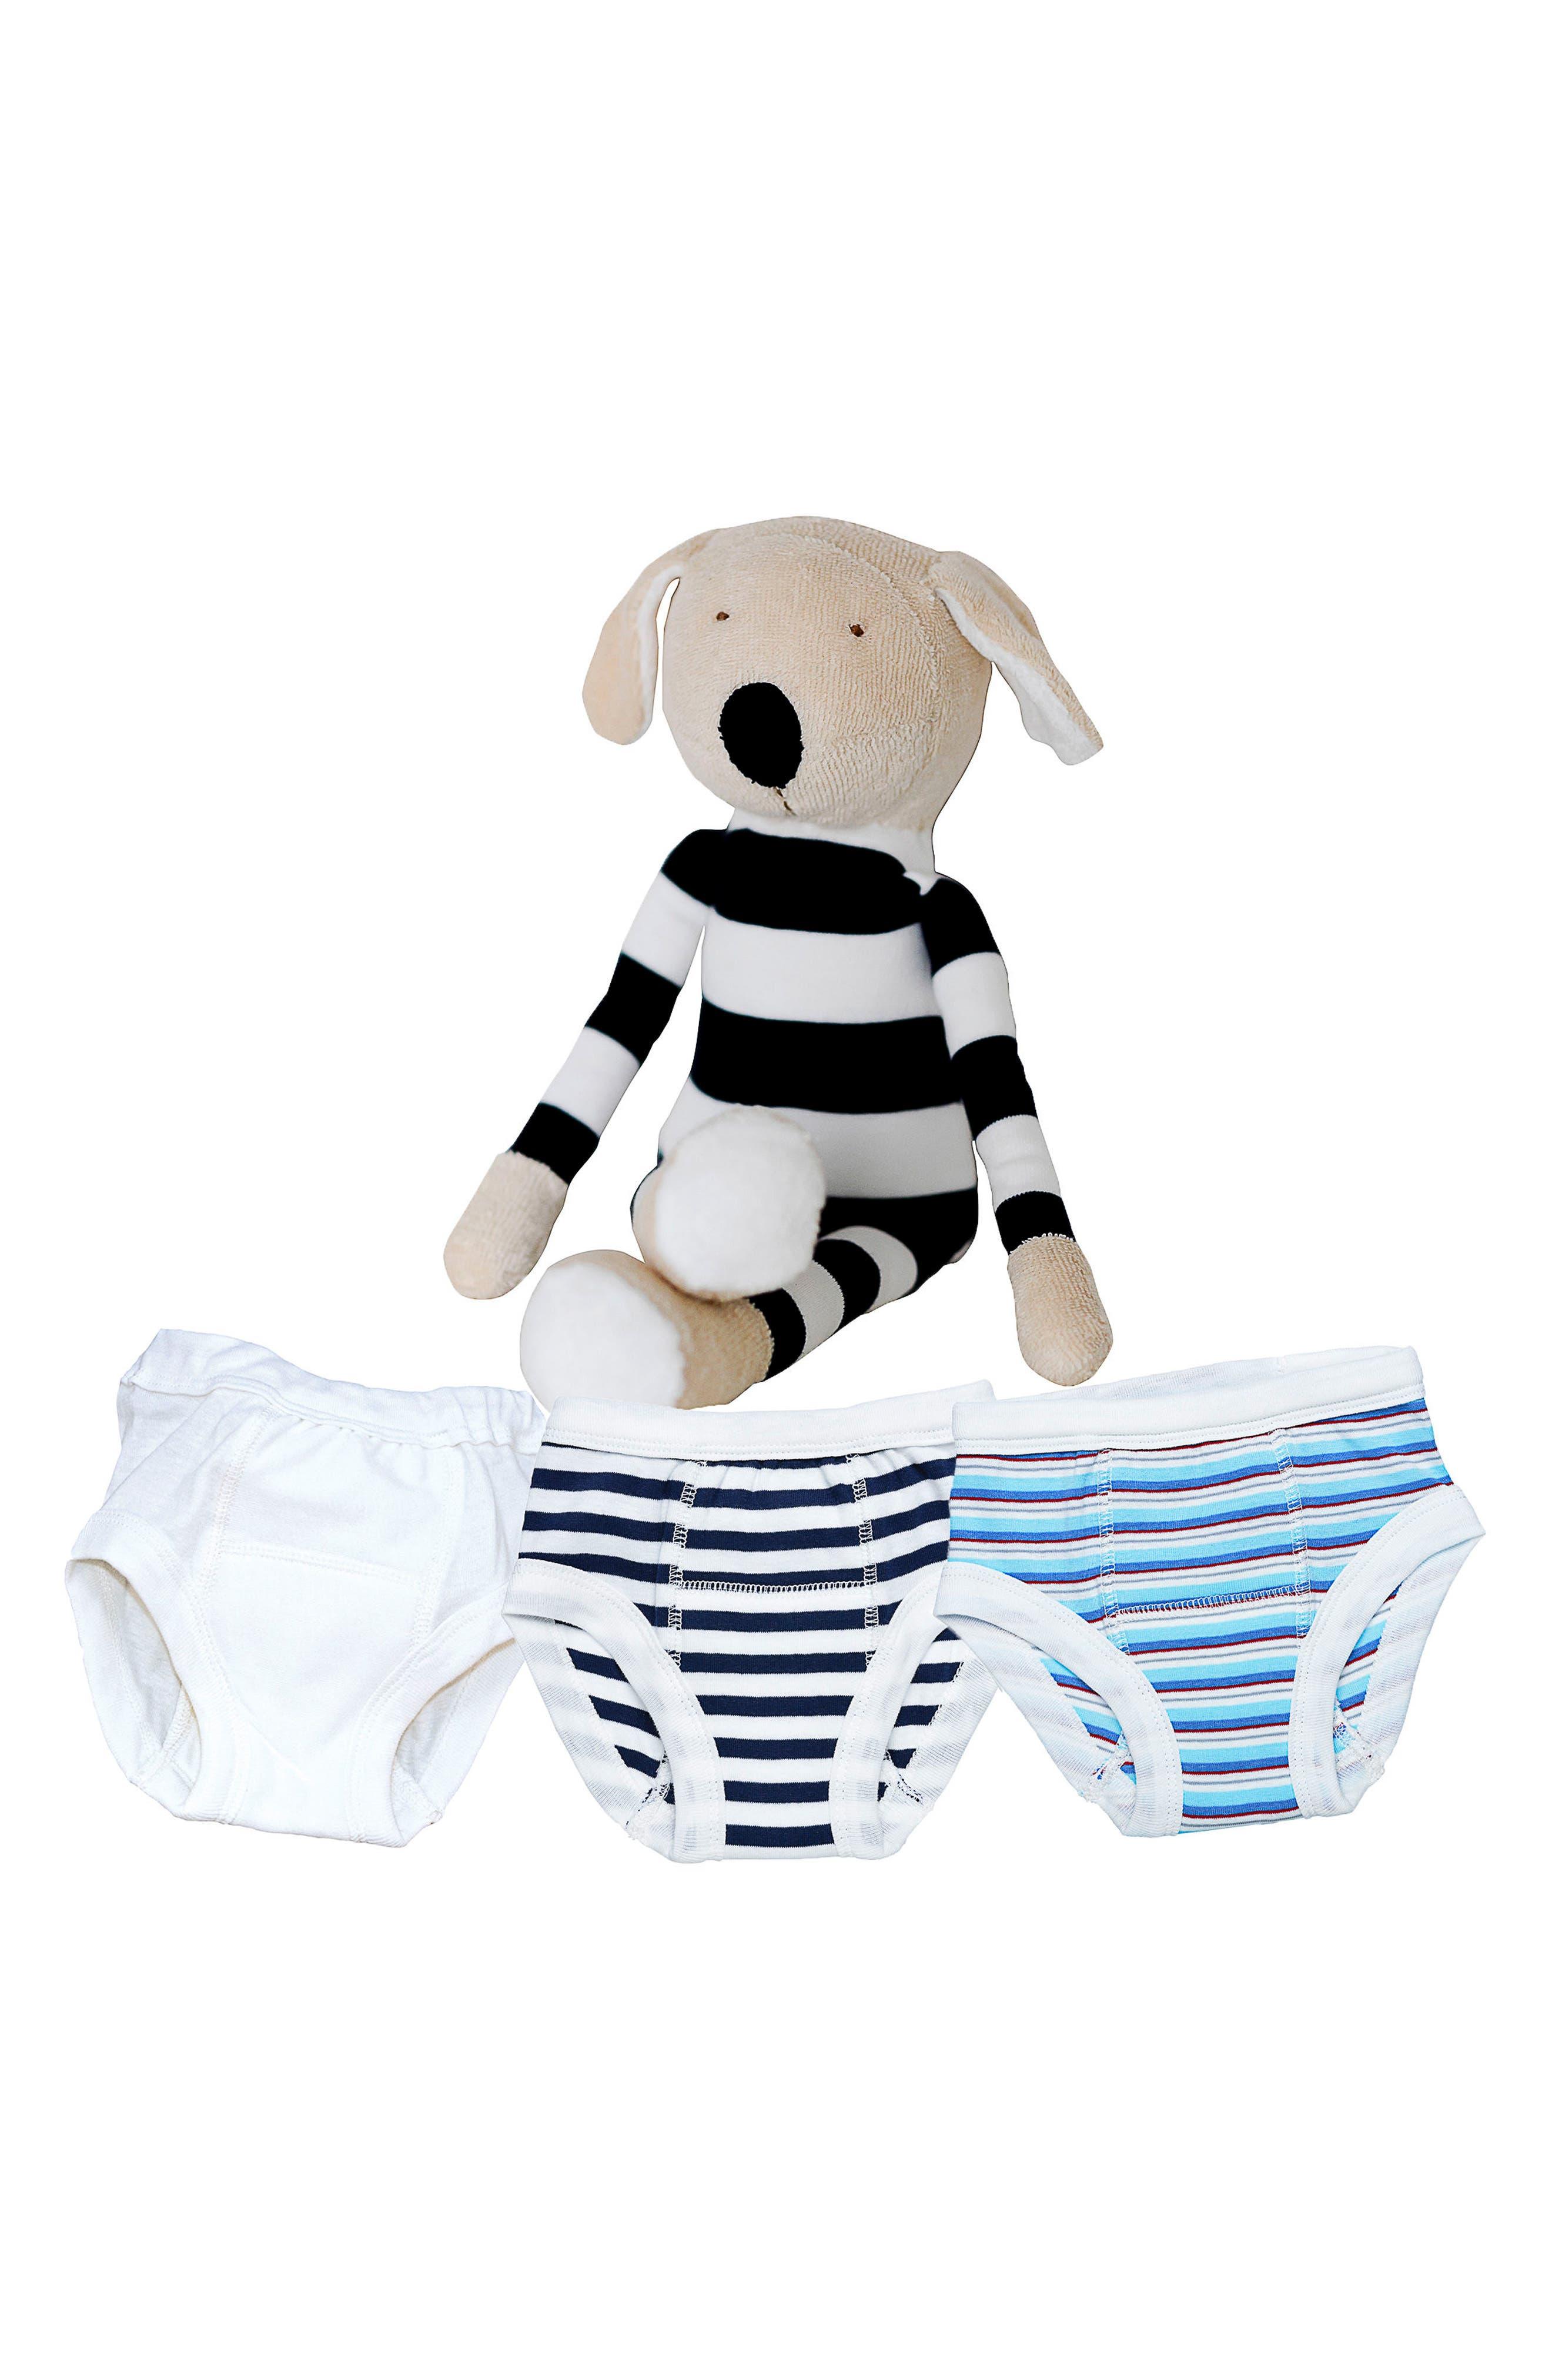 4-Piece Training Pants & Buddy Stuffed Animal Set,                         Main,                         color, 400